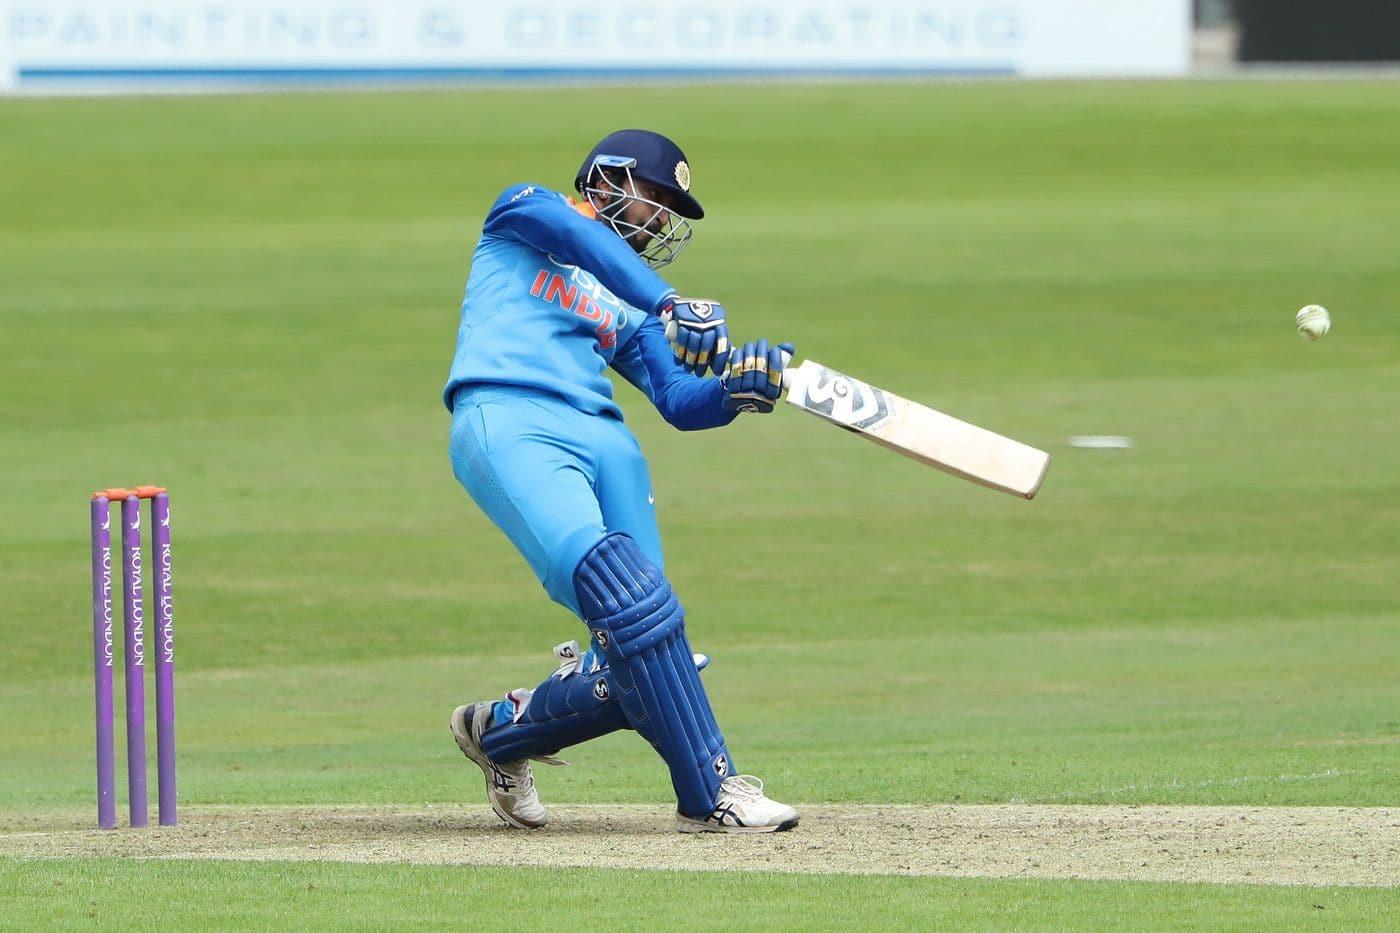 2nd T20I: Should Krunal Pandya bat higher for India?